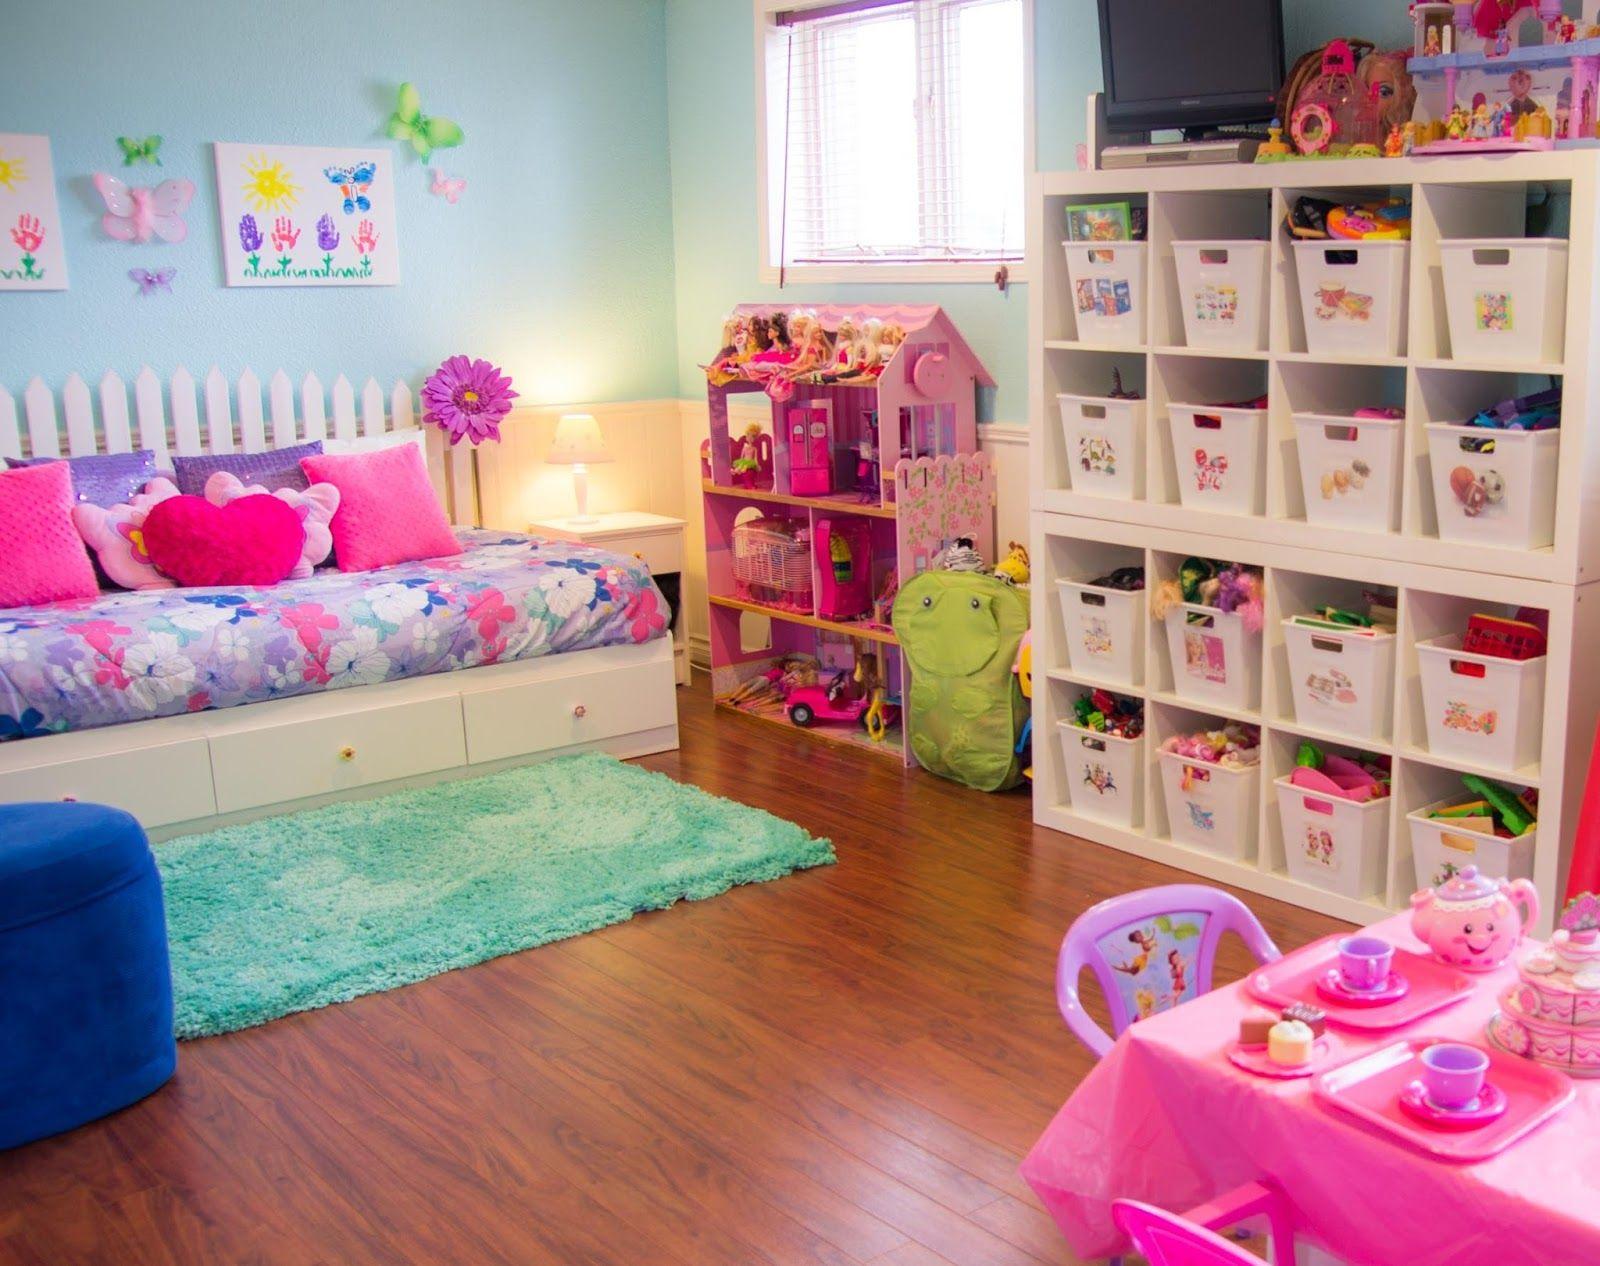 wonderful bedroom storage ideas creative purple kids design | Skay Blue and White Themed DIY Kids Room Design with ...